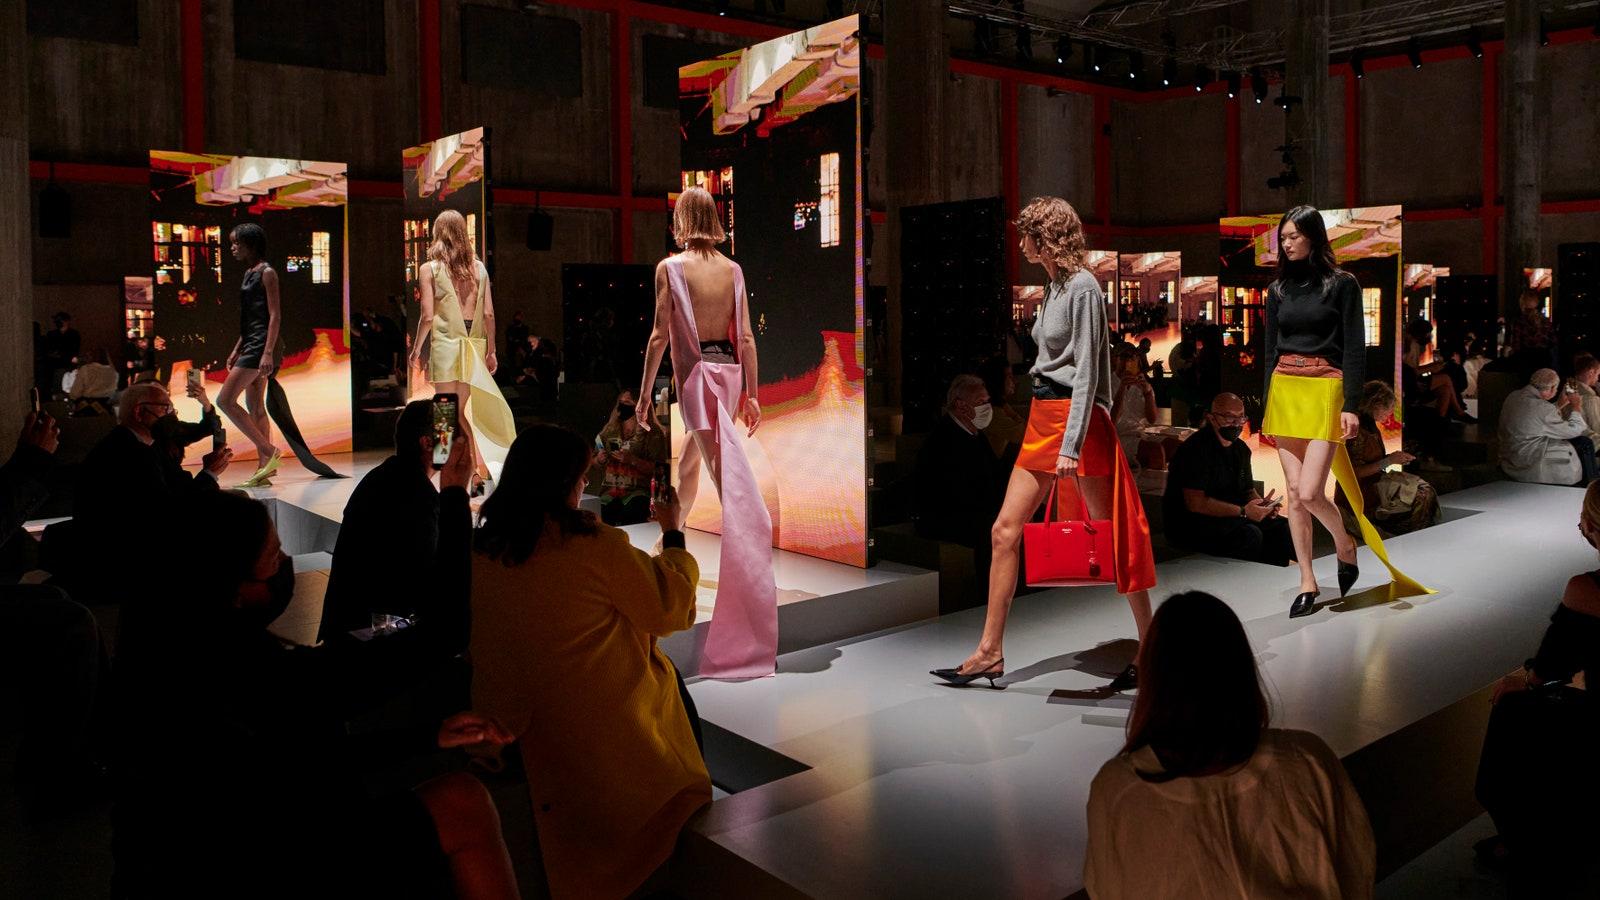 prada - Gli highlights della Milano Fashion Week P/E 22